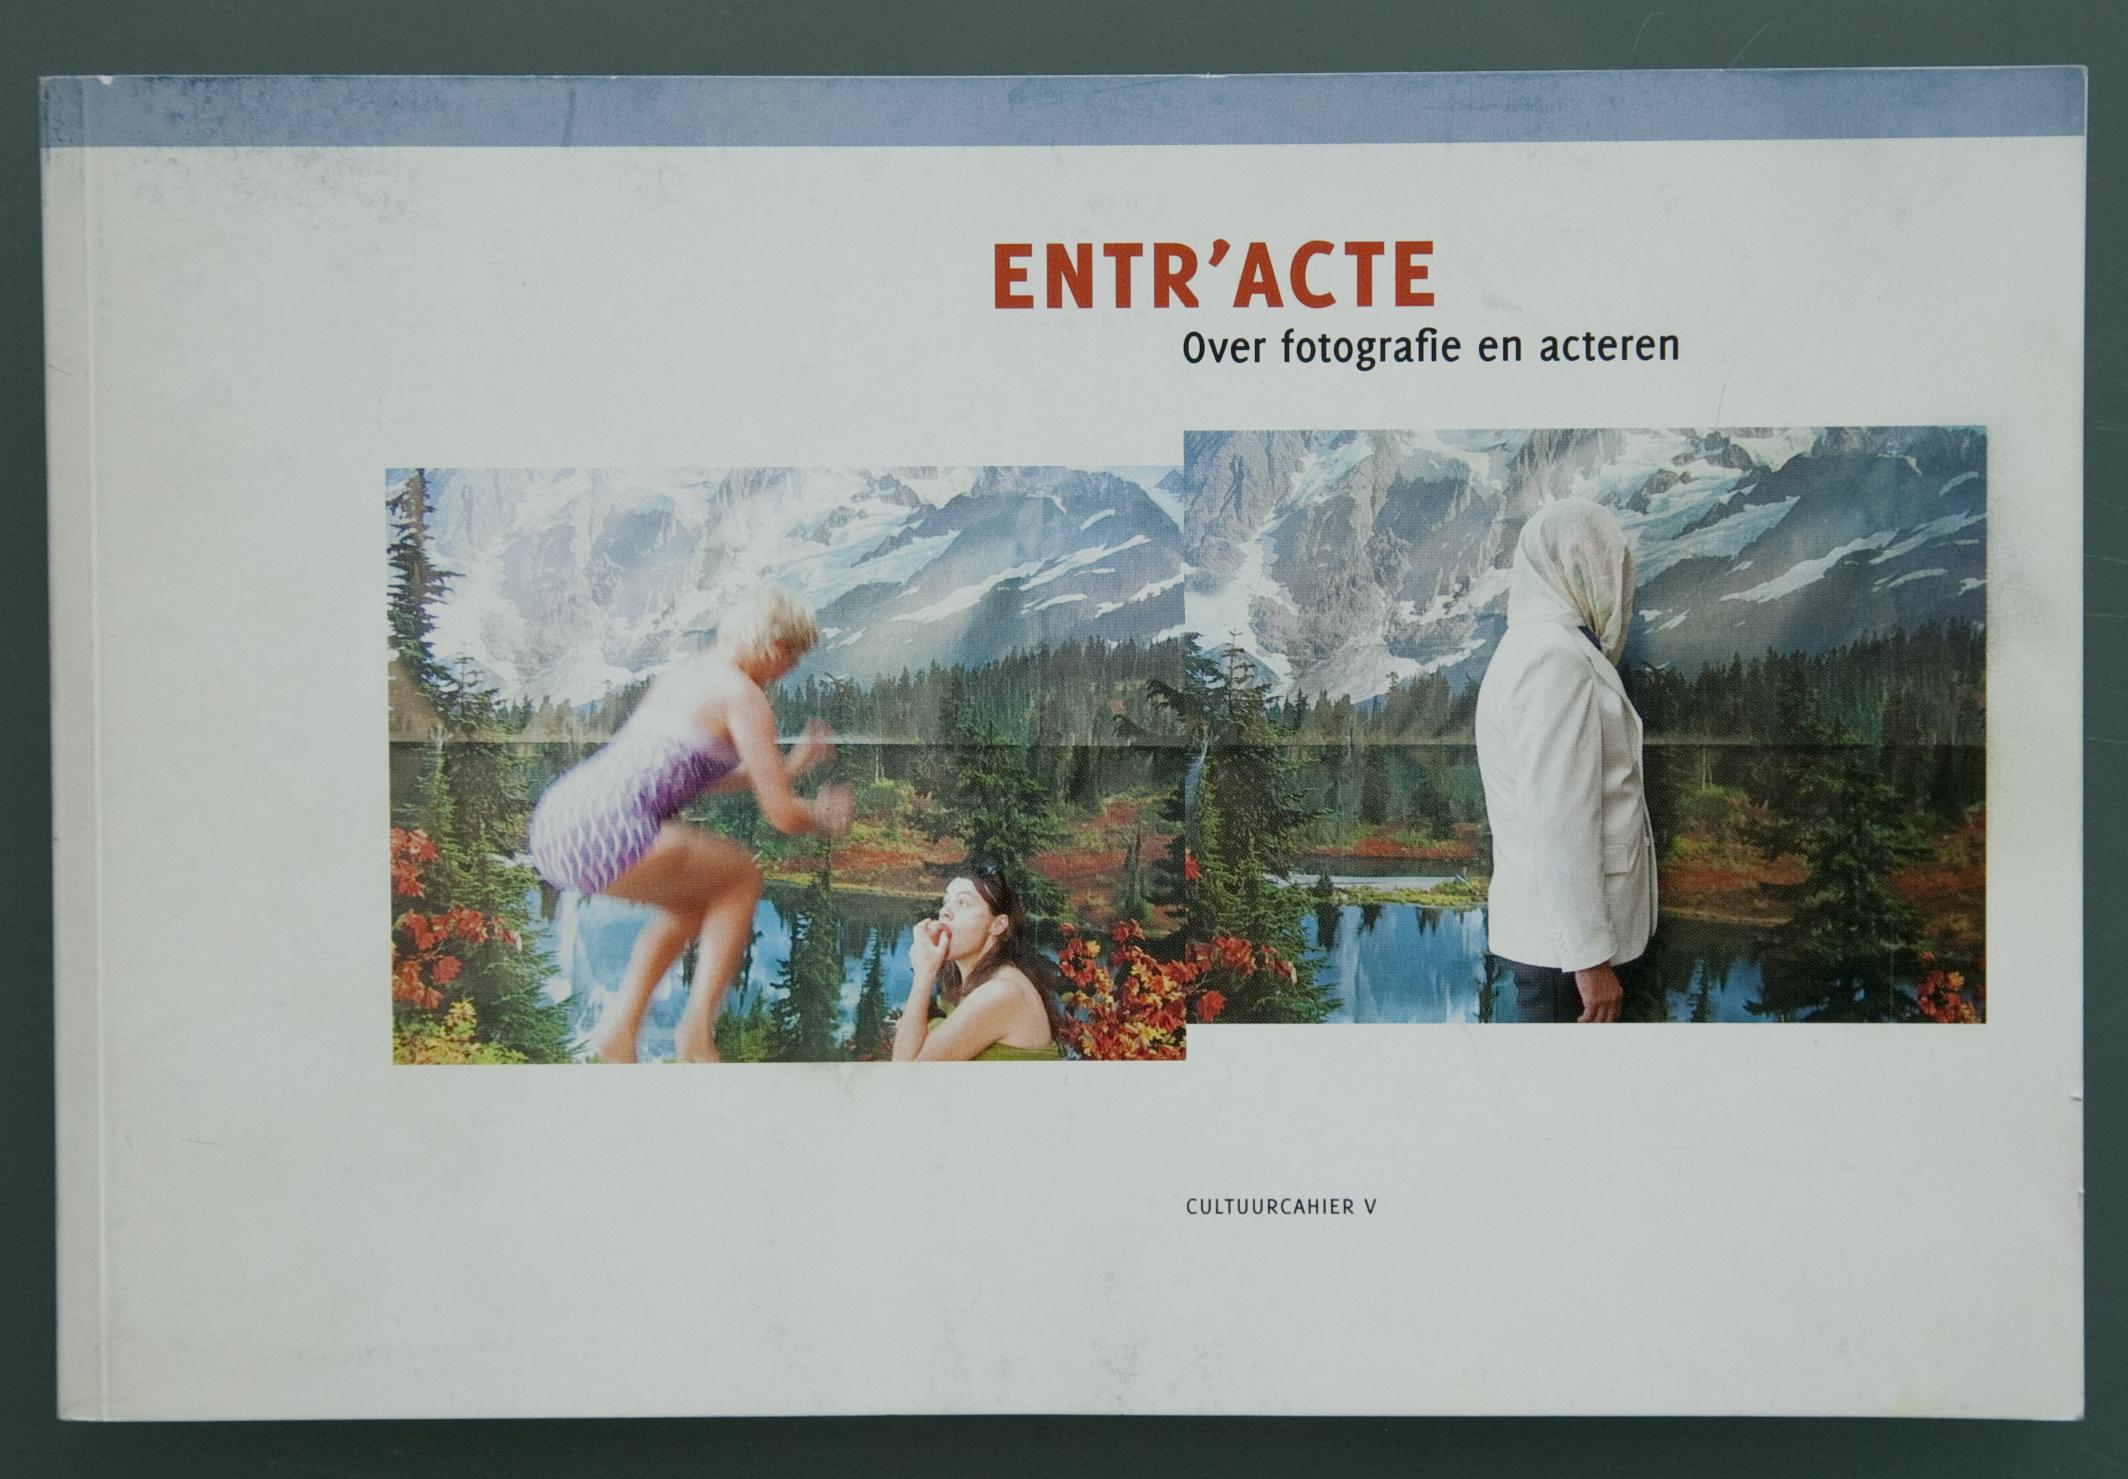 Ent'racte catalogue, a cultuurcahier V edition by Hogeschool Gent. front image: Fien Muller